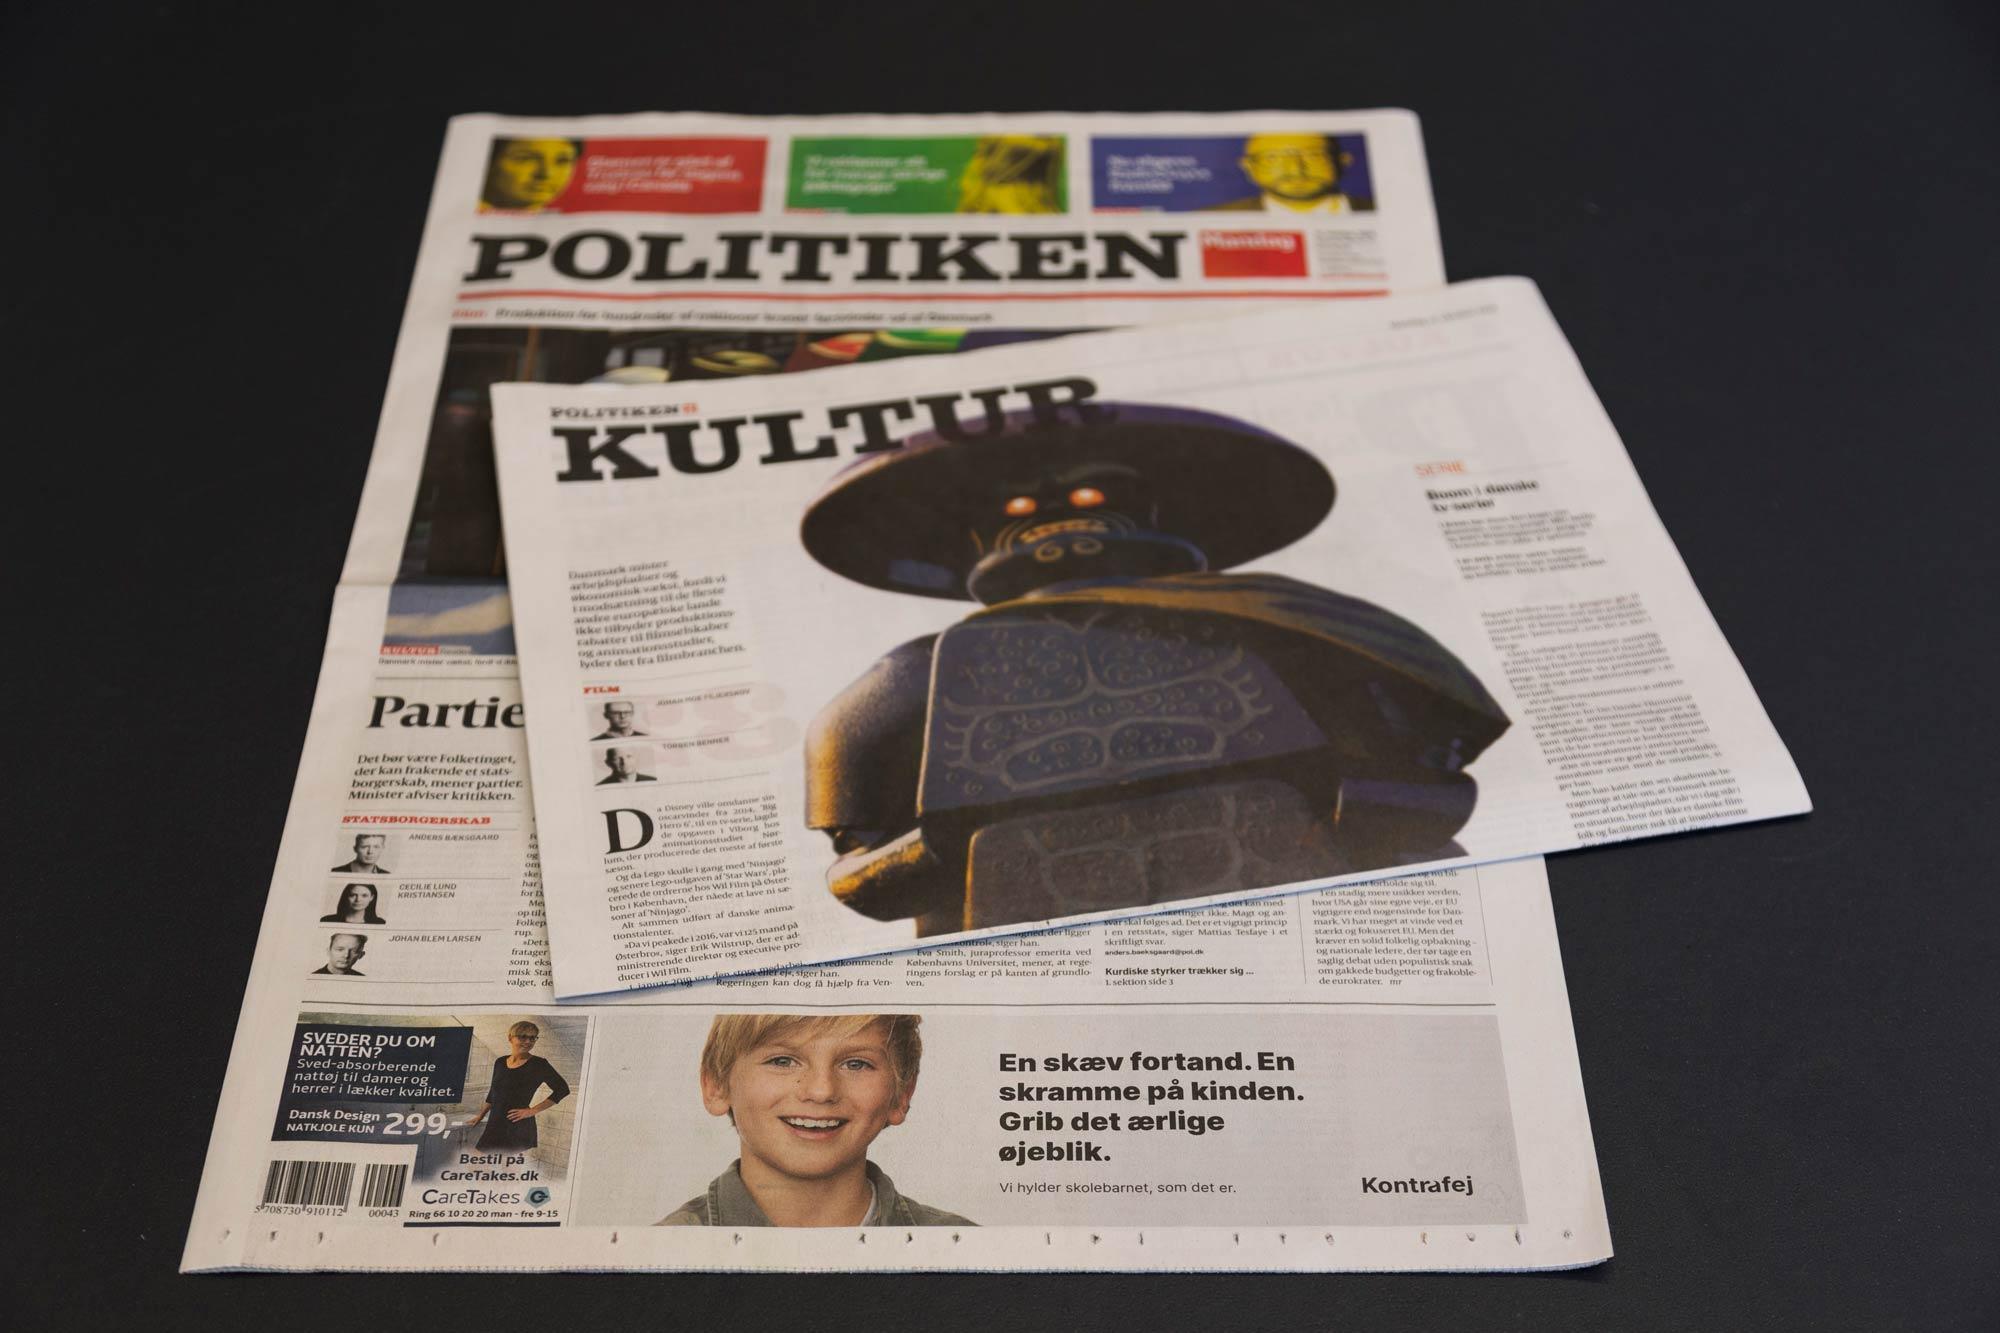 Cover of politiken newspaper